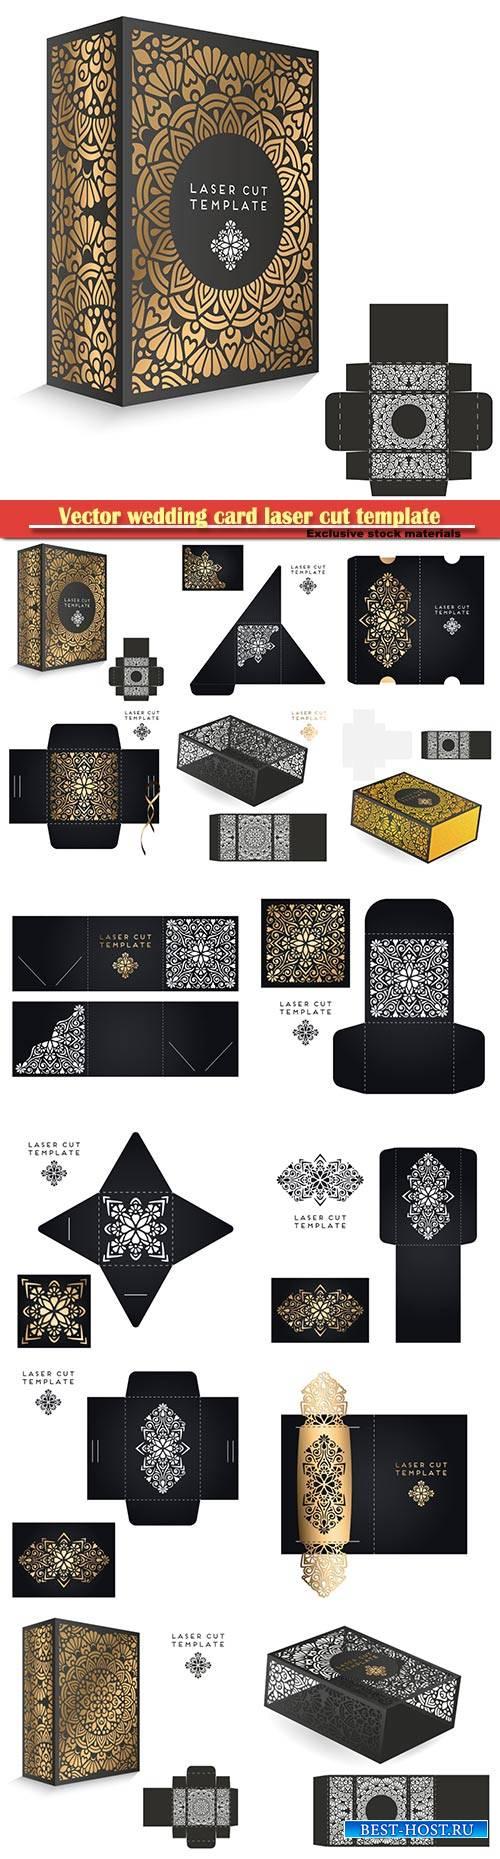 Vector wedding card laser cut template, vintage decorative elements